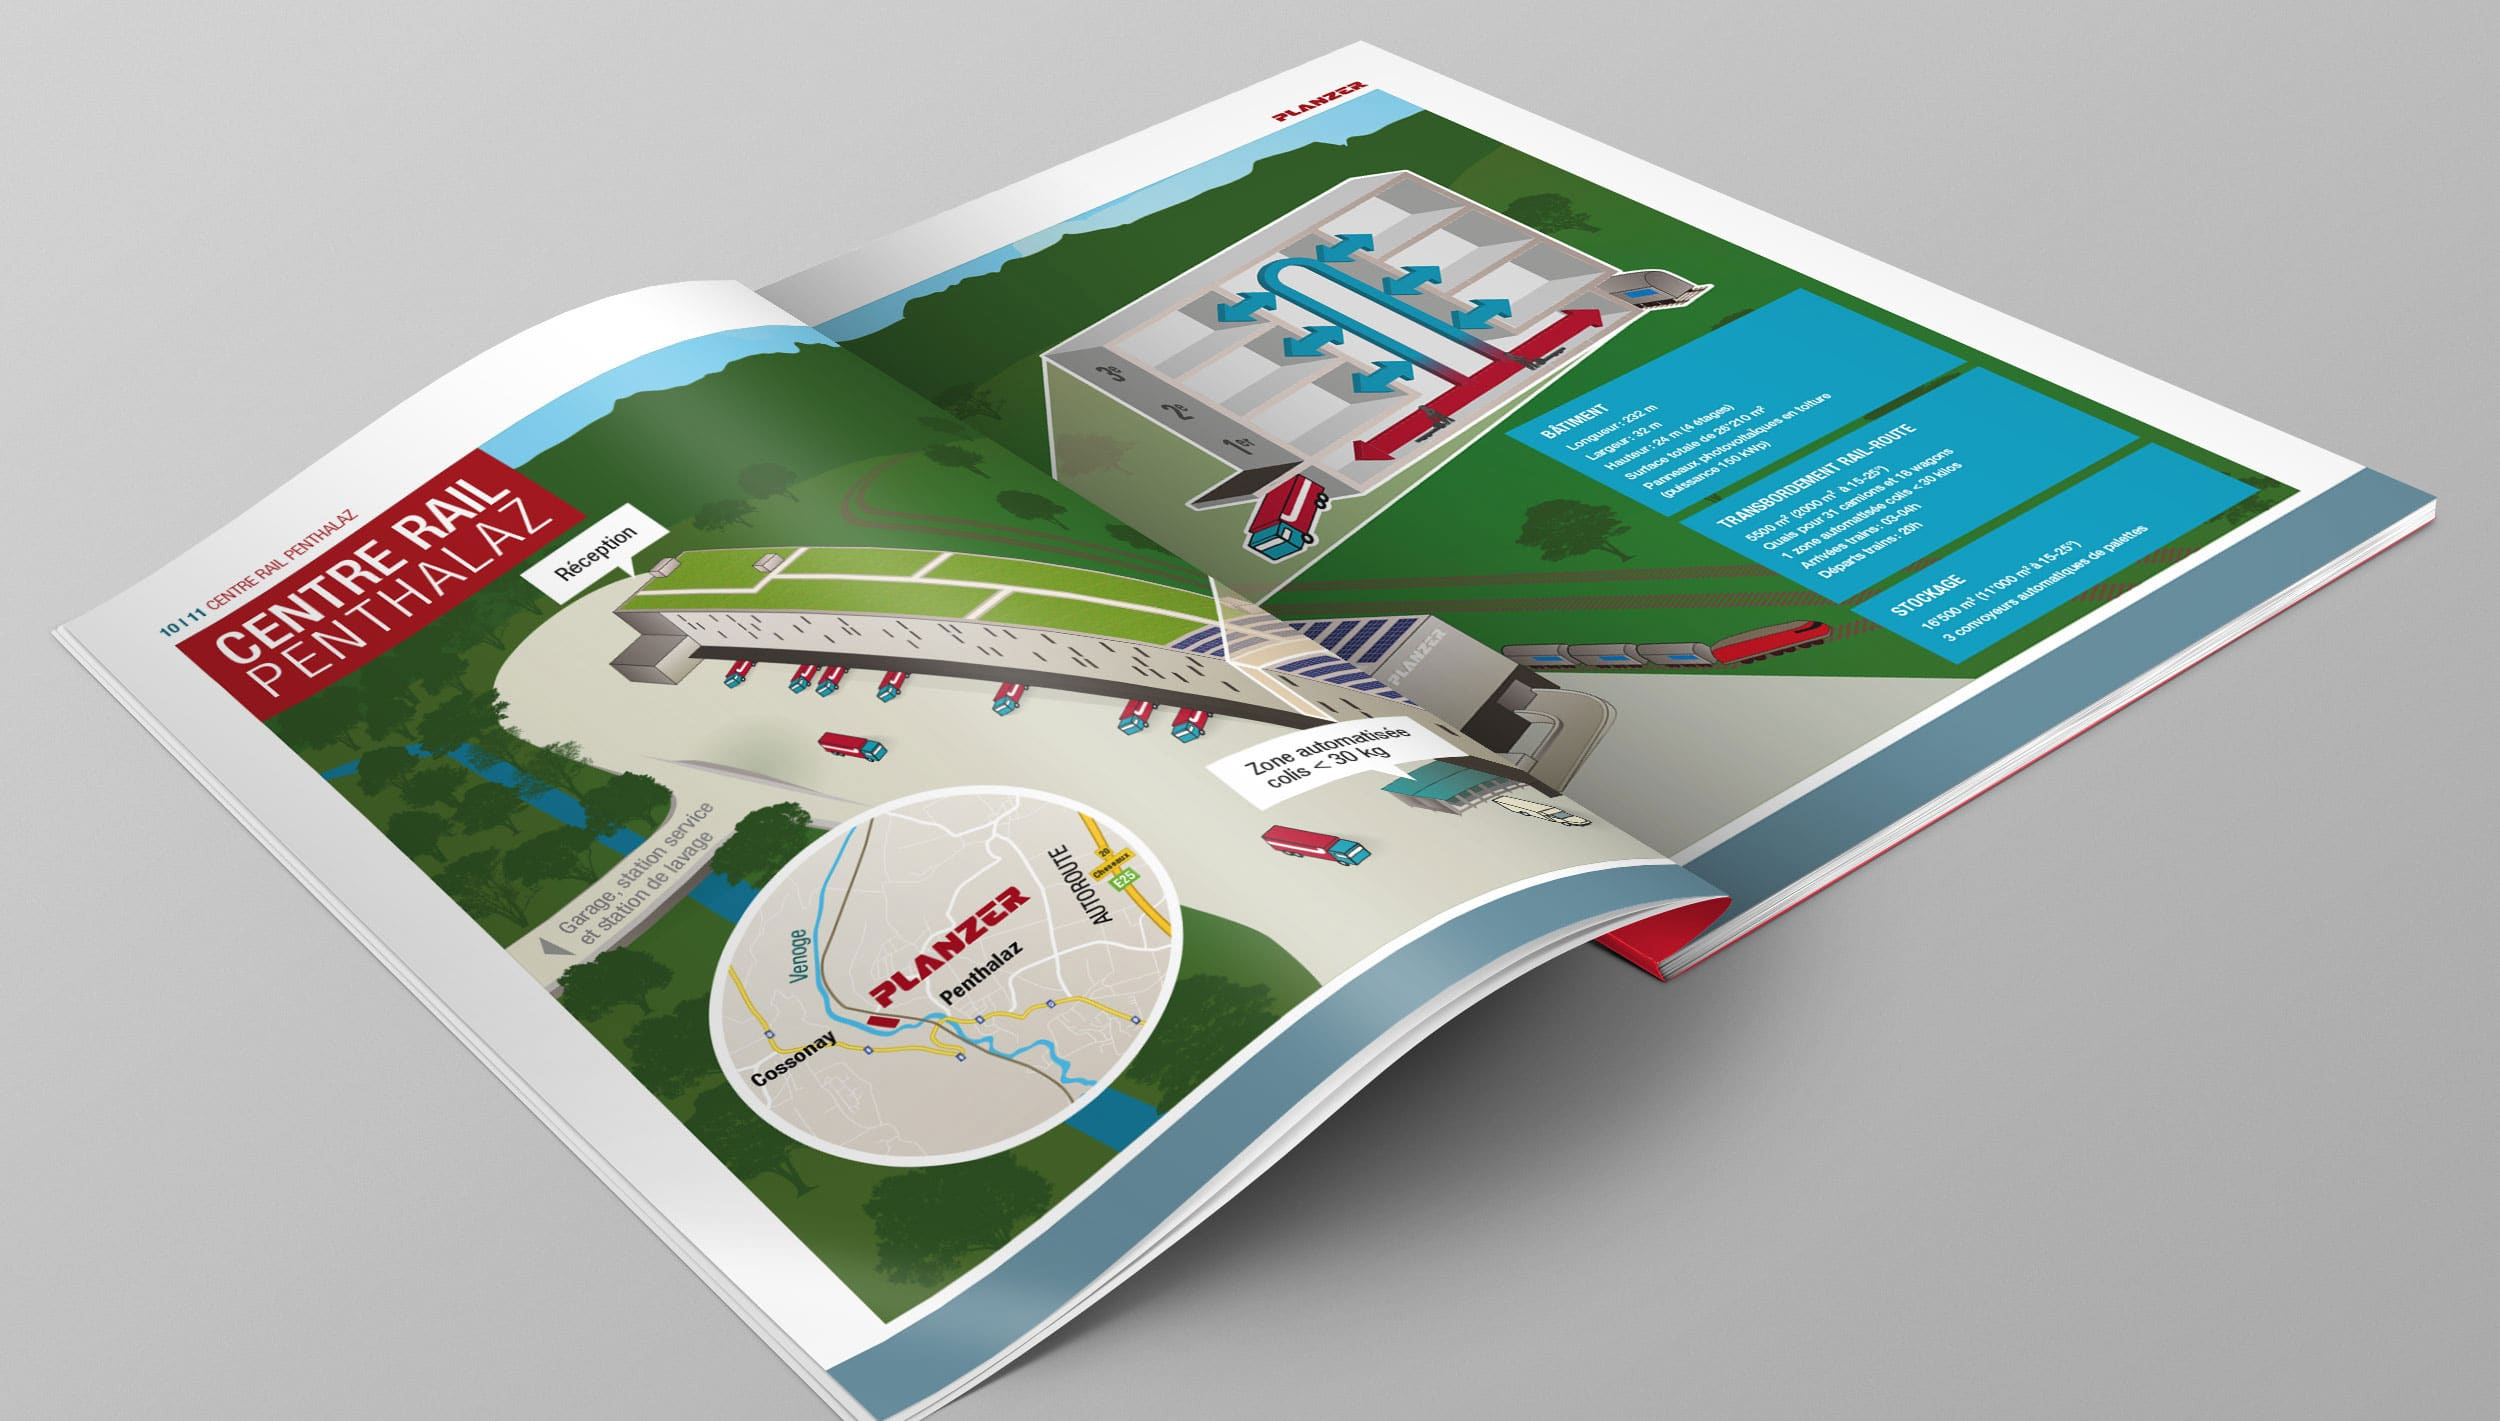 Dossier de presse Planzer infographie